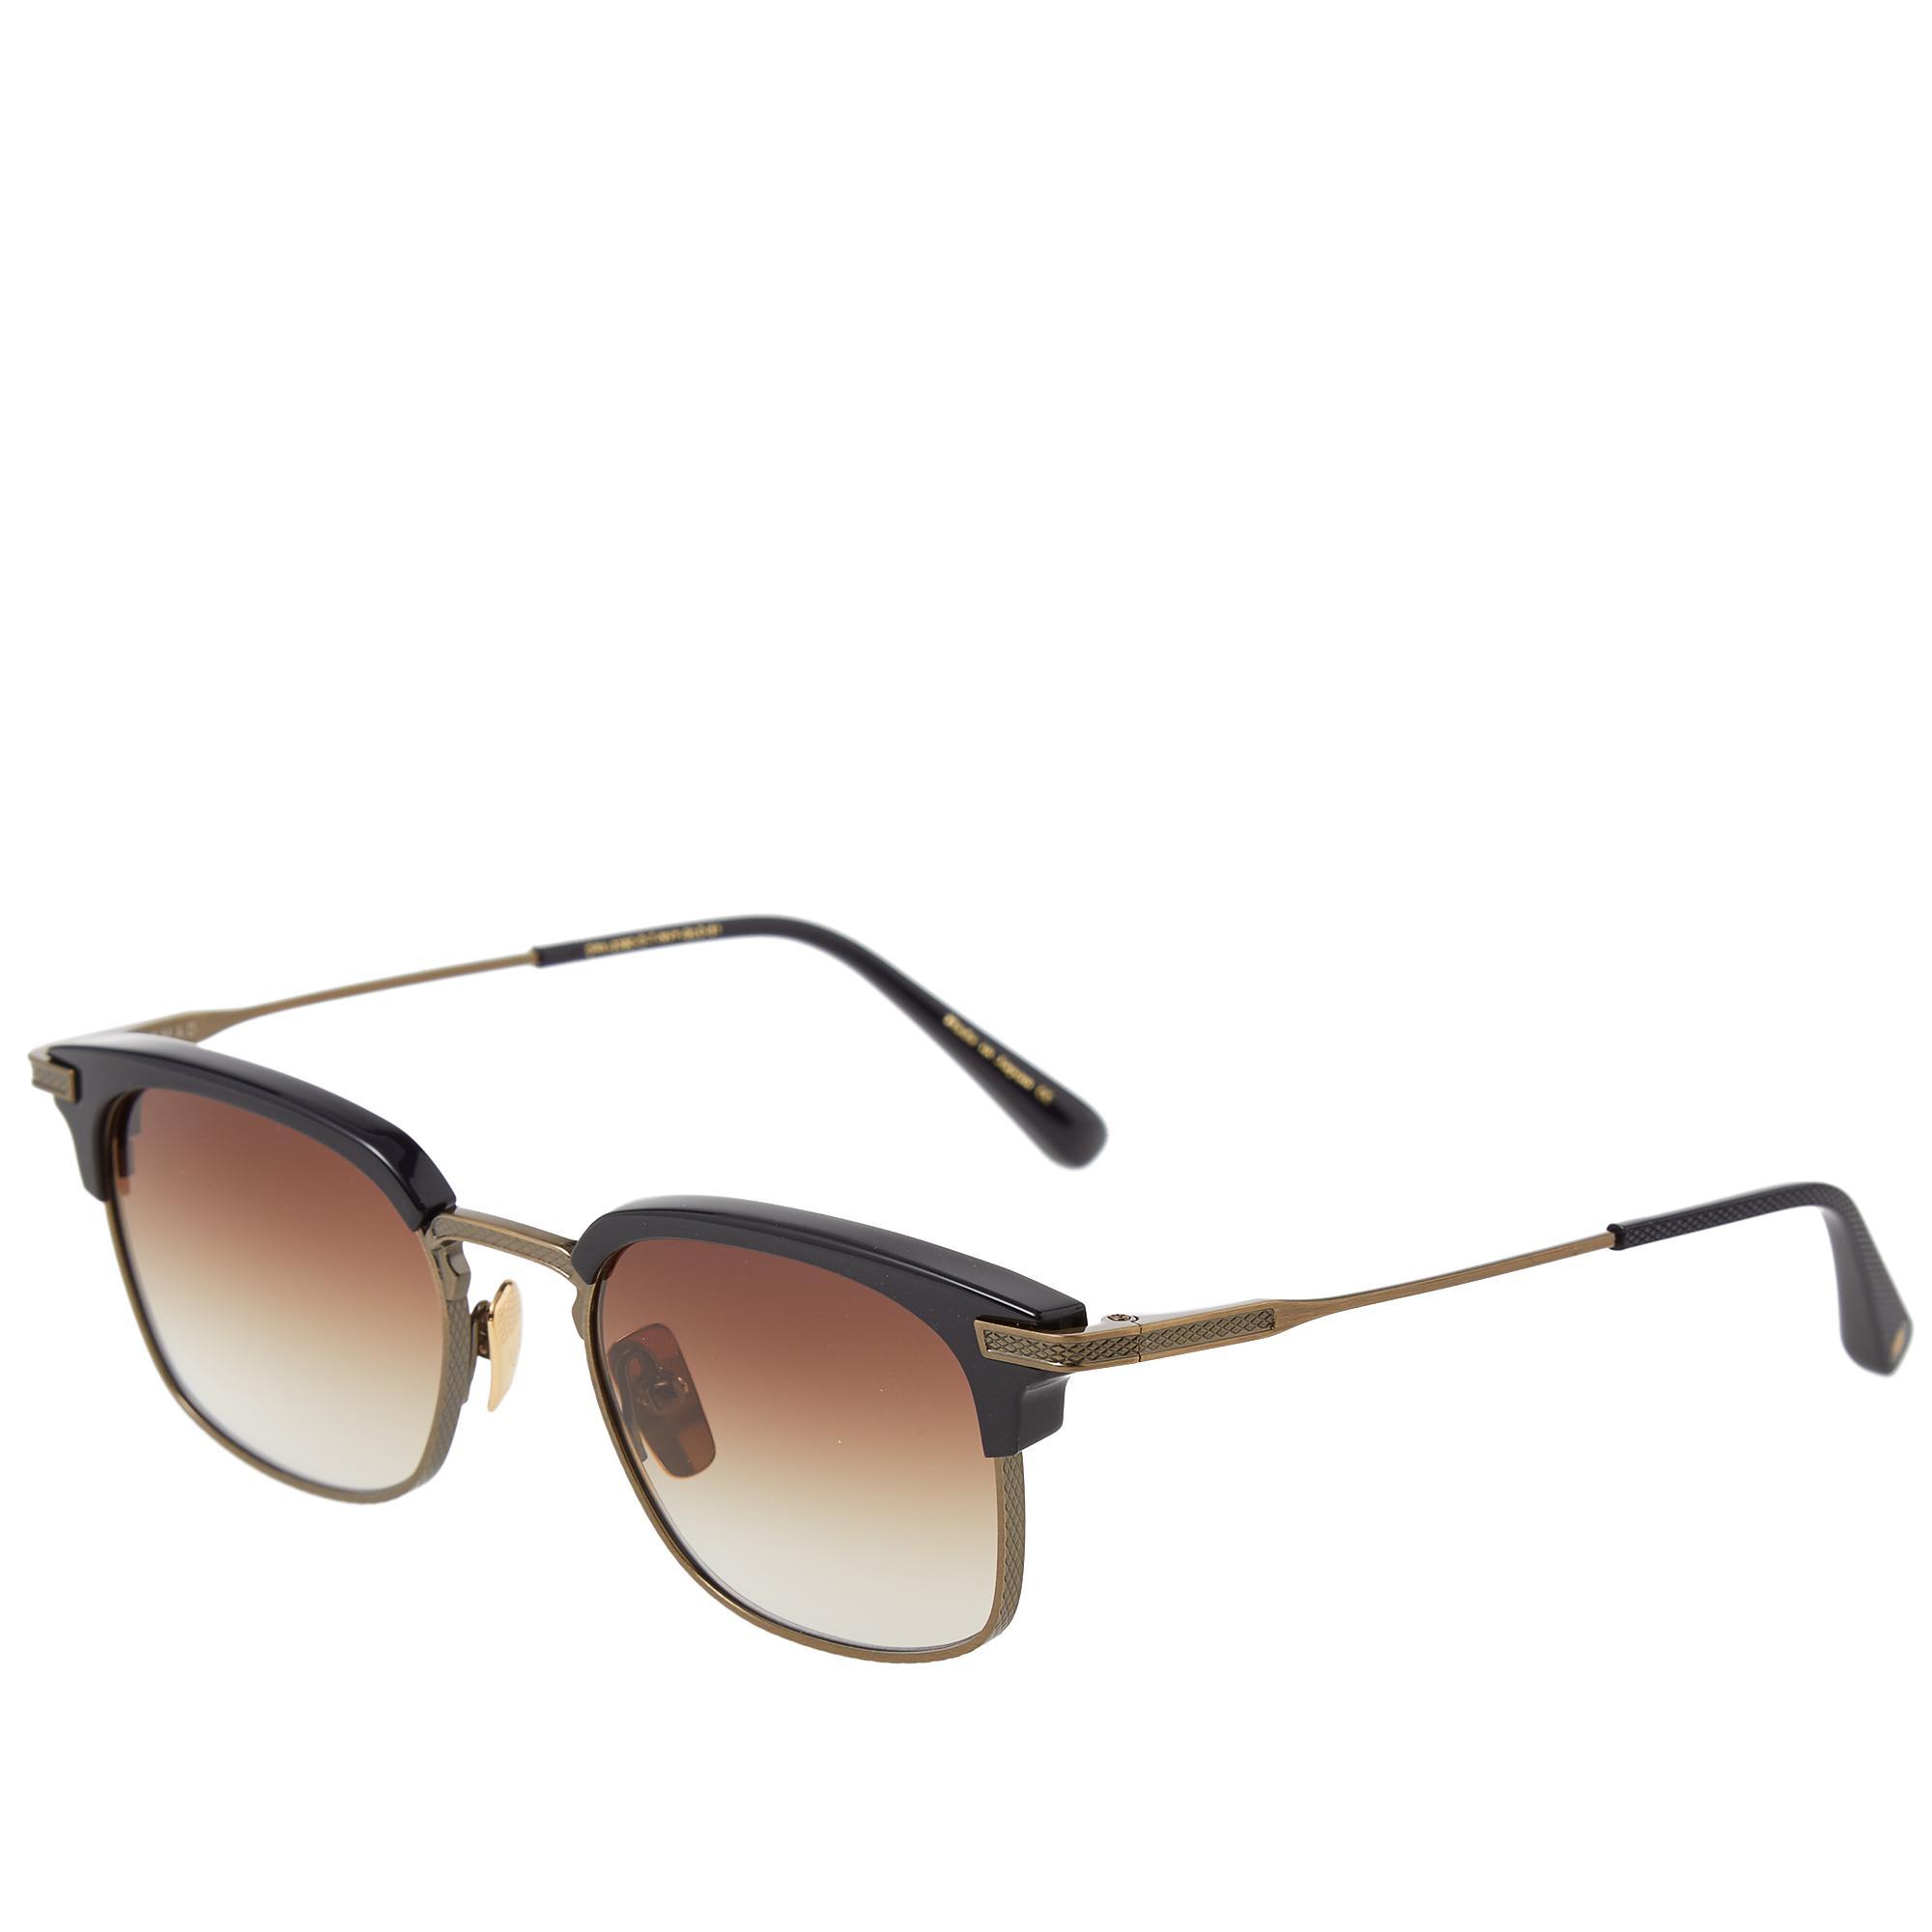 7434361eb1 Lyst - DITA Nomad Sunglasses in Blue for Men